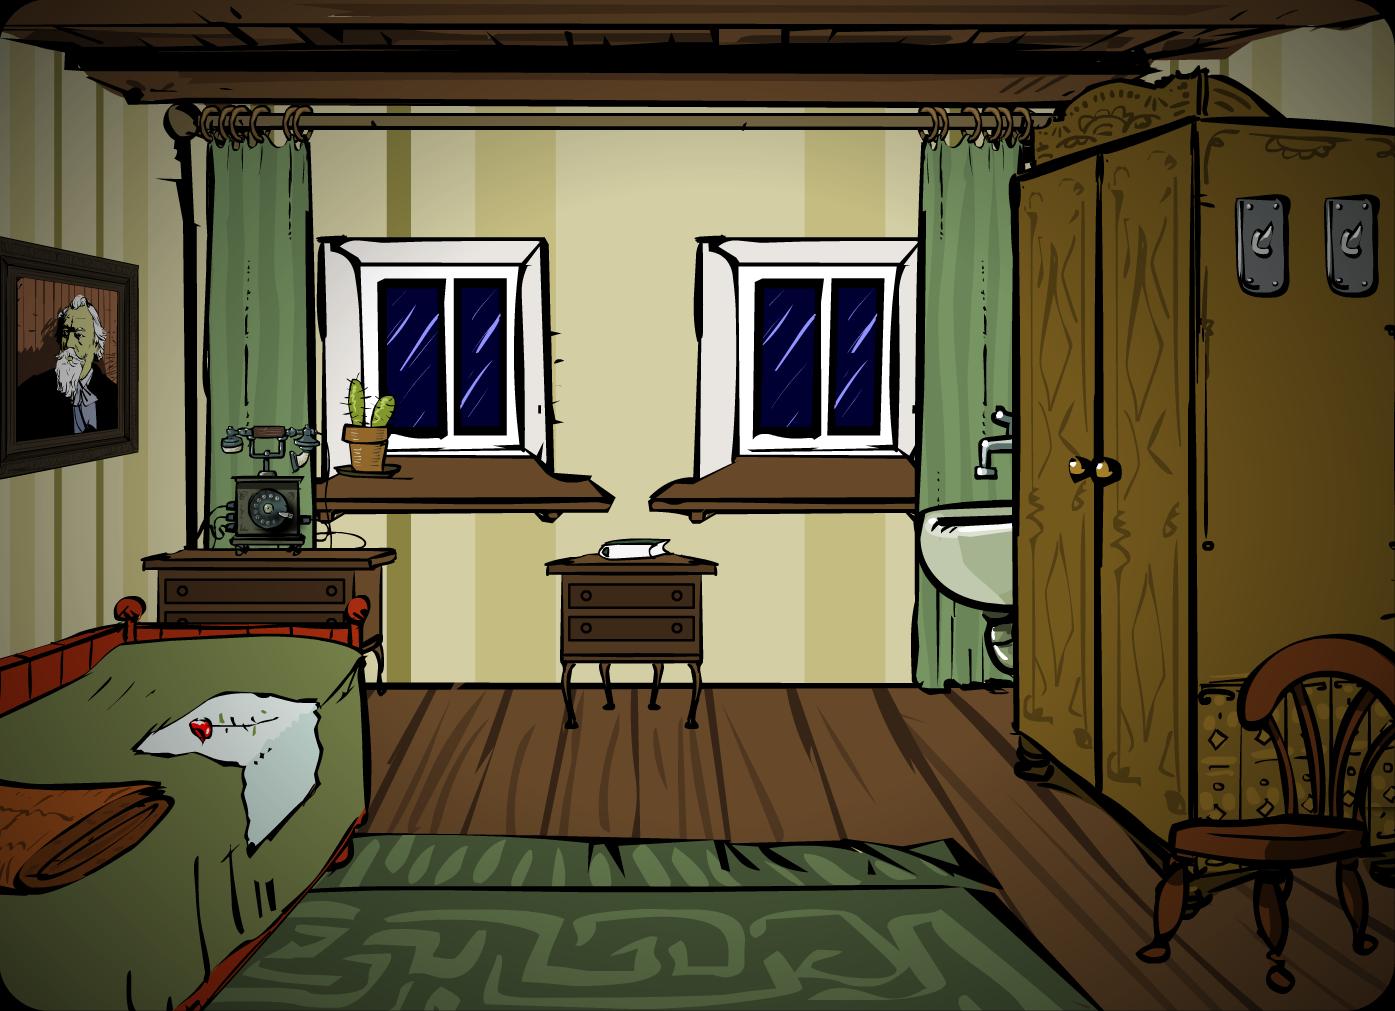 File:Room 12.png